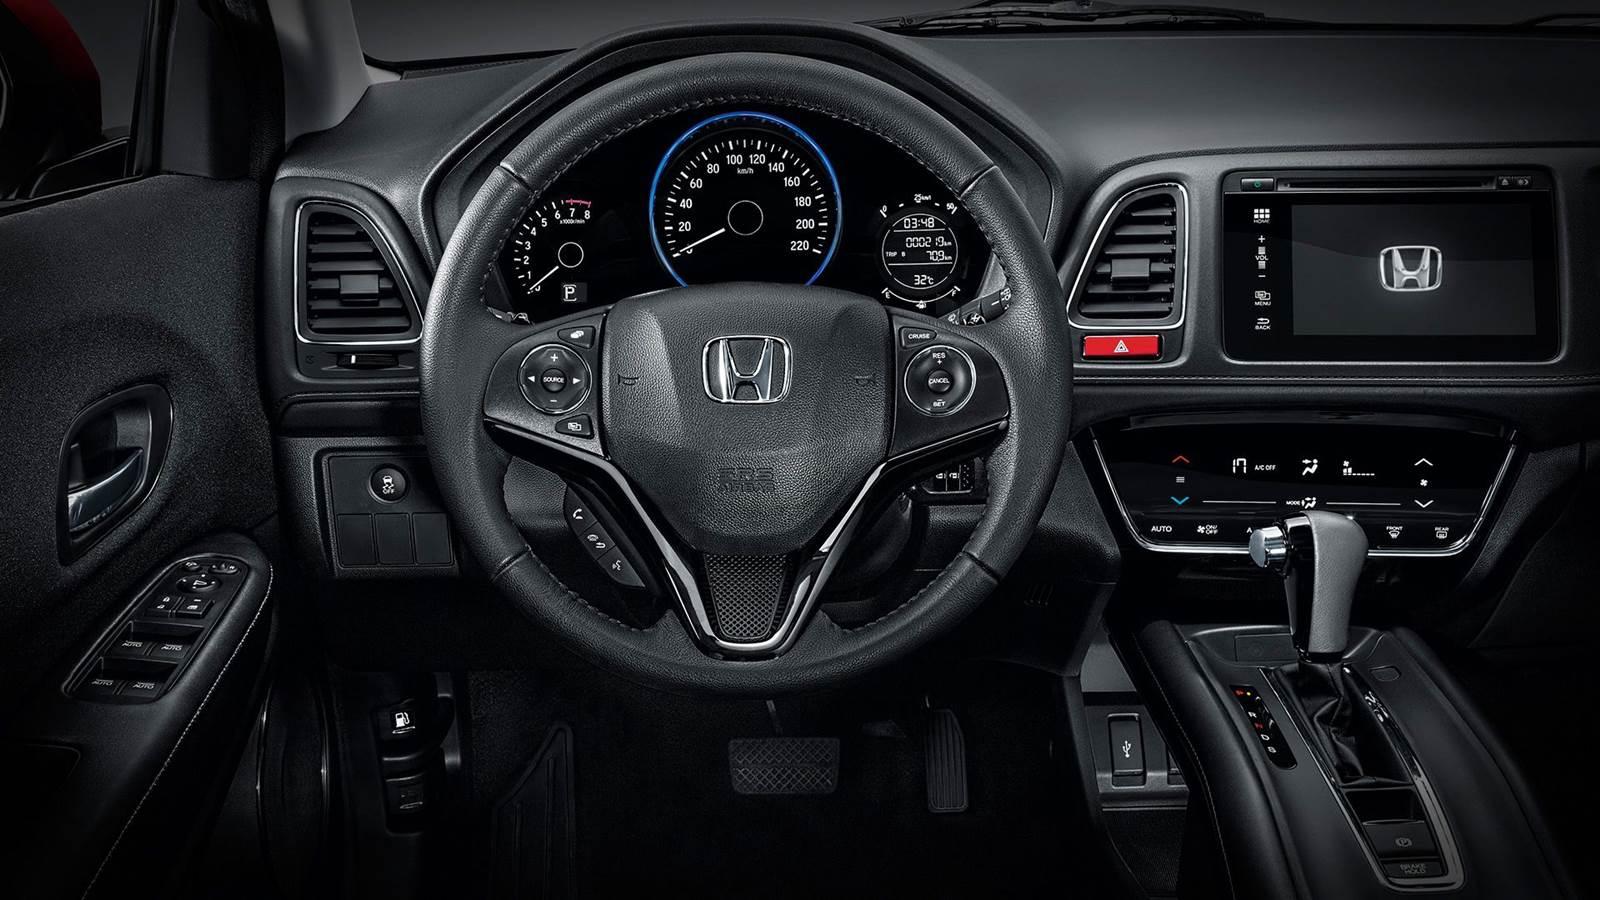 Novo Honda HR-V - interior - painel